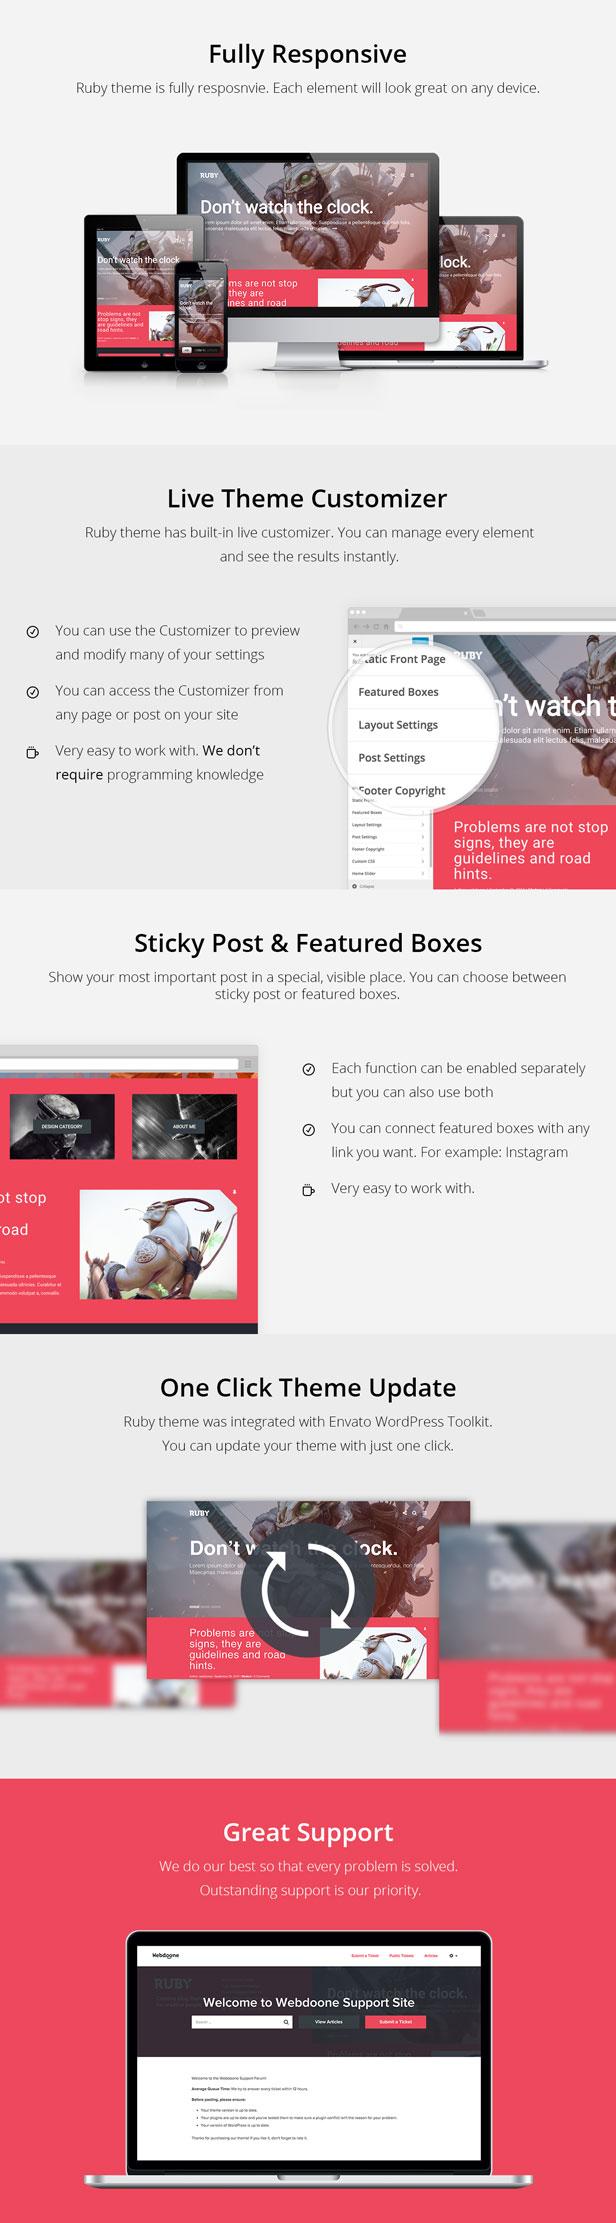 Ruby Theme - Ein kreatives WordPress-Blog-Theme - 3